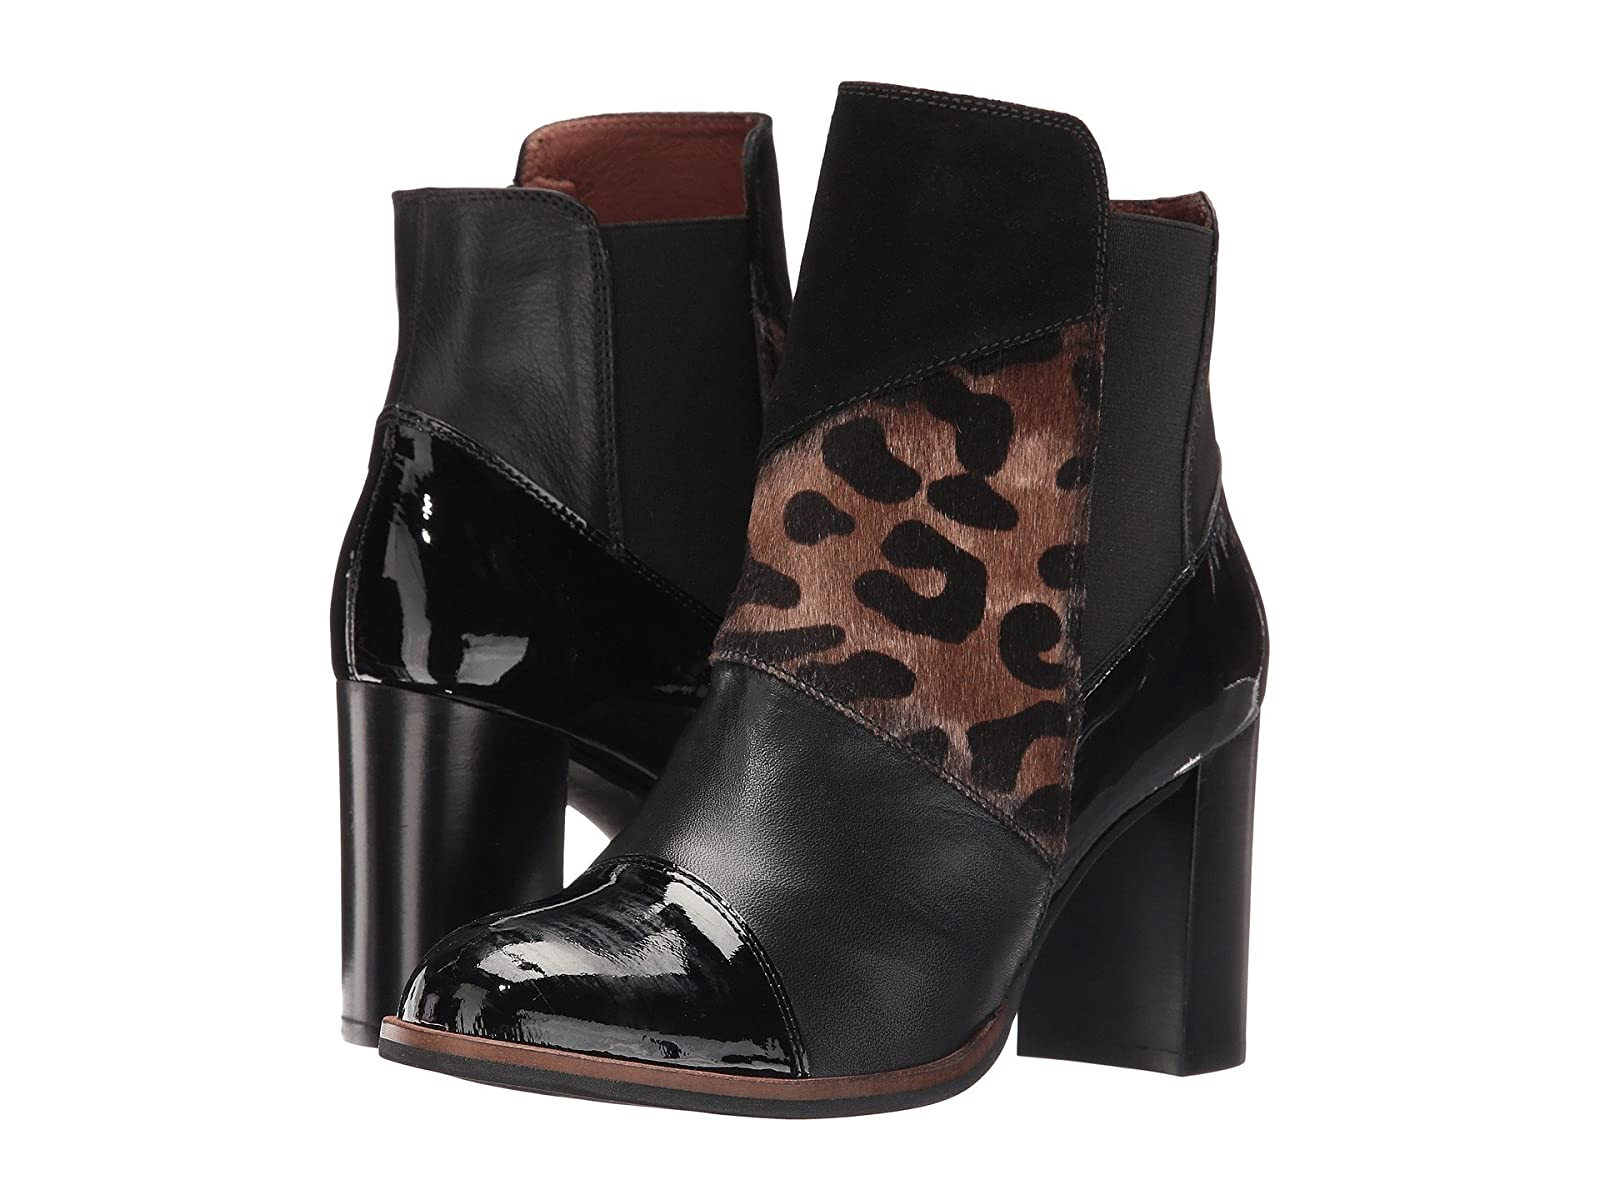 Hispanitas BevinCheap and distinctive eye-catching shoes